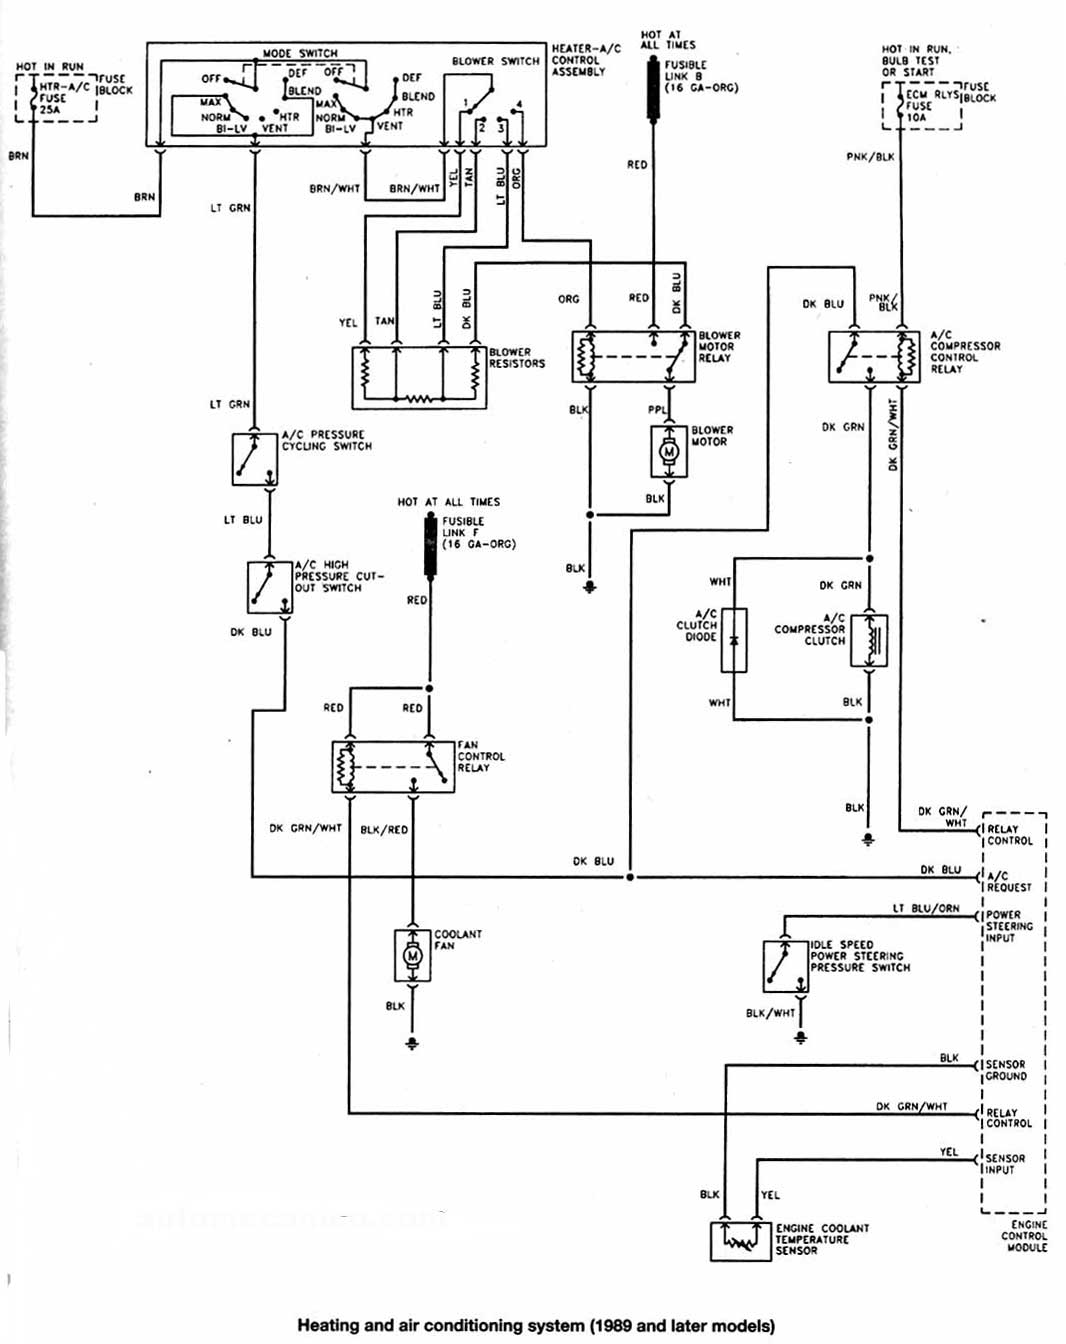 2001 pontiac montana engine diagram peugeot 407 wiring 2002 sunfire imageresizertool com